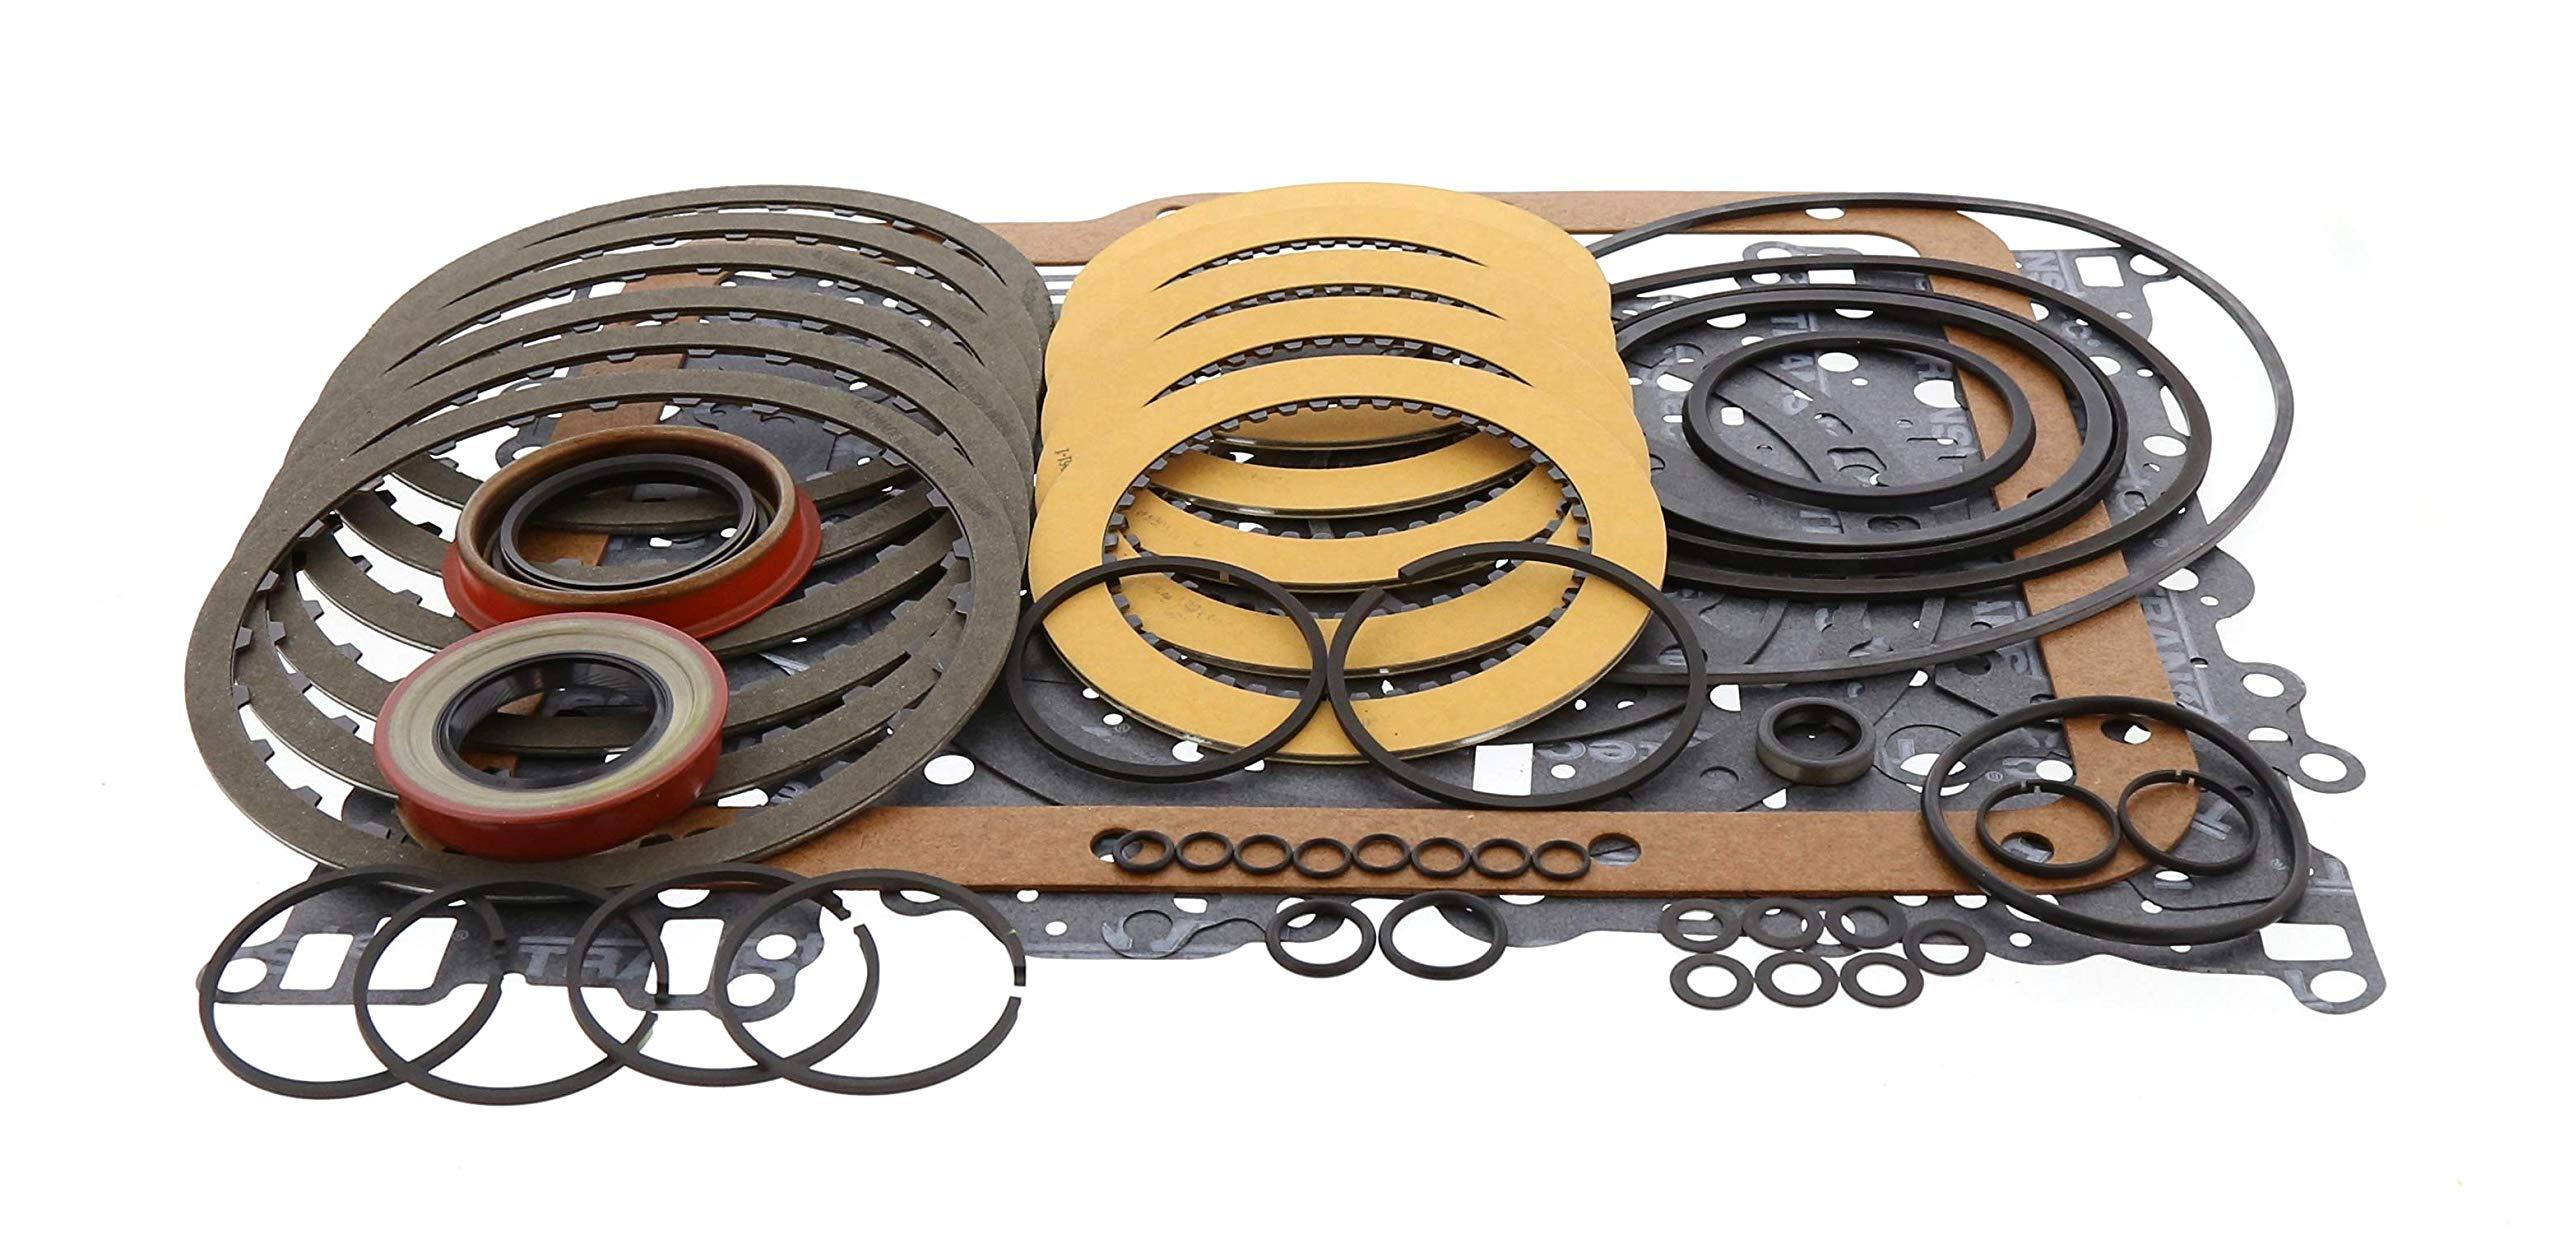 Chevy Aluminum Powerglide Transmission Less Steel Rebuild Kit 62-73